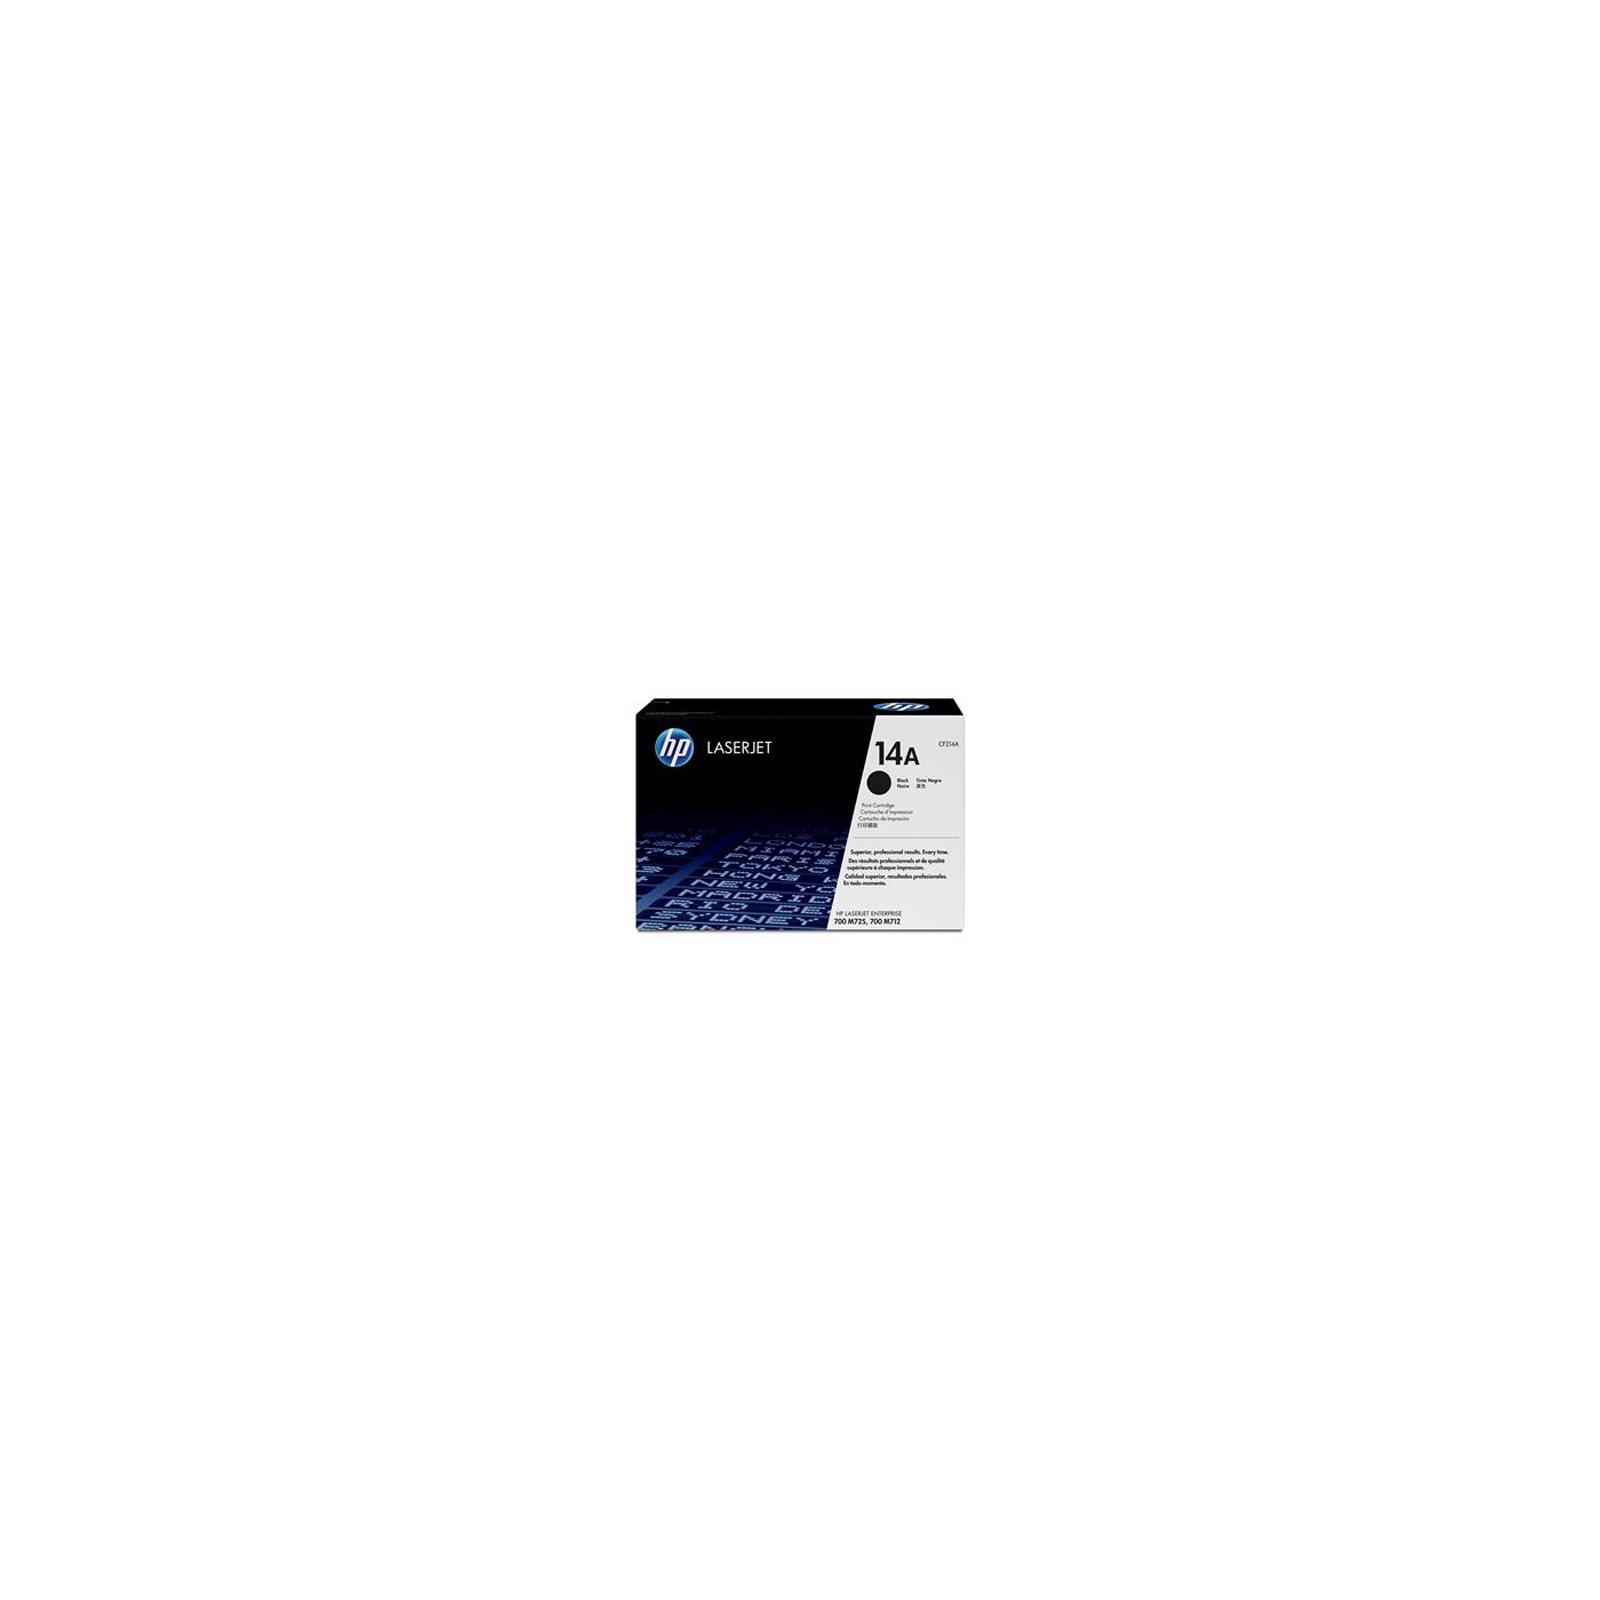 Картридж HP LJ M712dn/M712xh (14A) (CF214A)